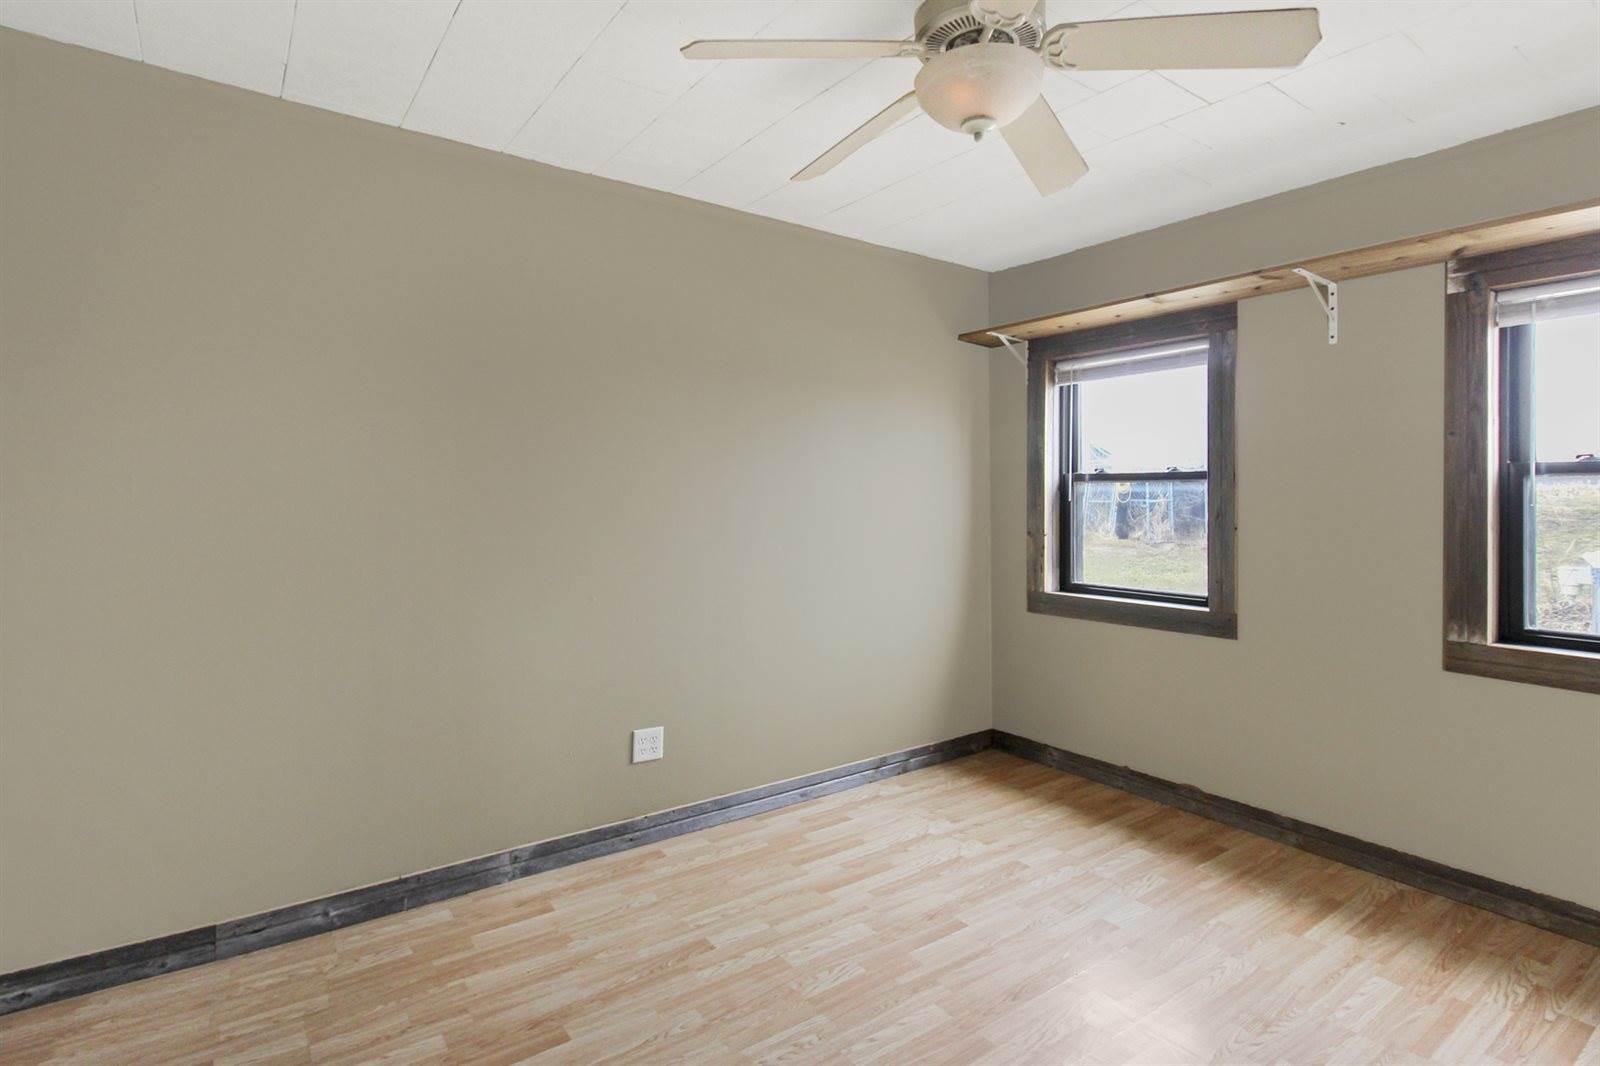 11511 Hulbert, Winslow, IL 61089